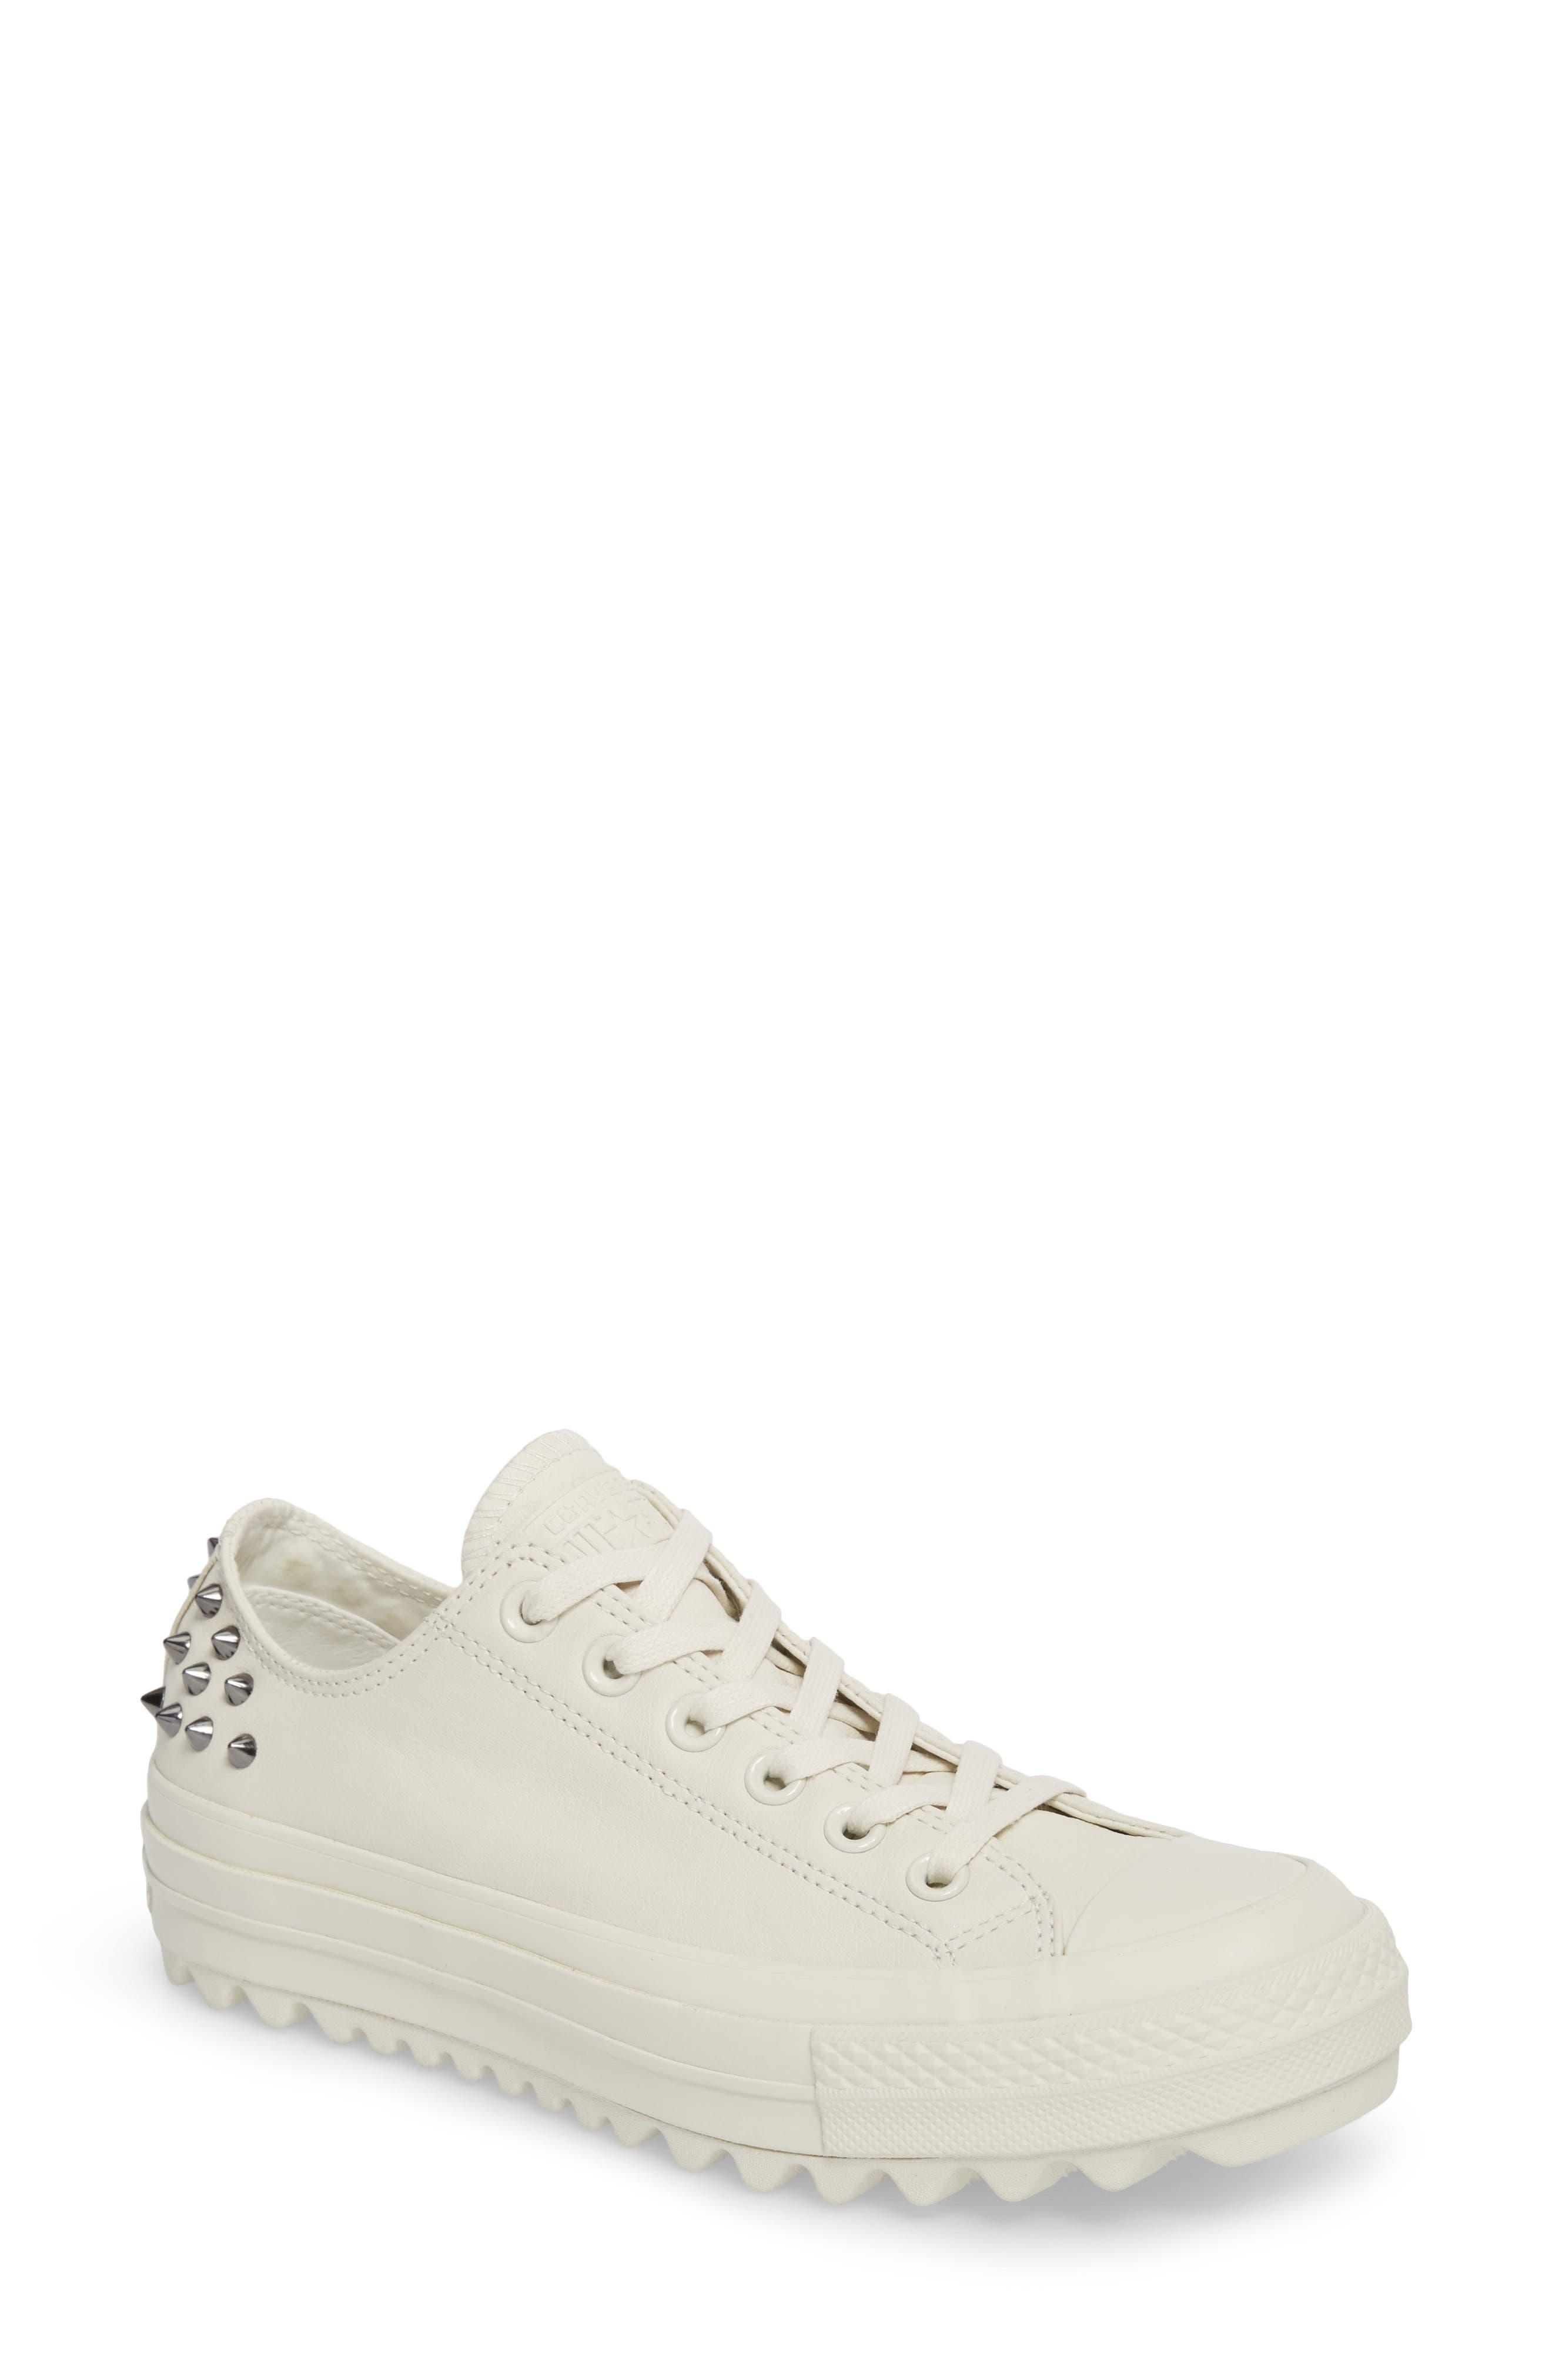 Studded Lift Ripple Sneaker,                             Main thumbnail 1, color,                             Vaporous Gray